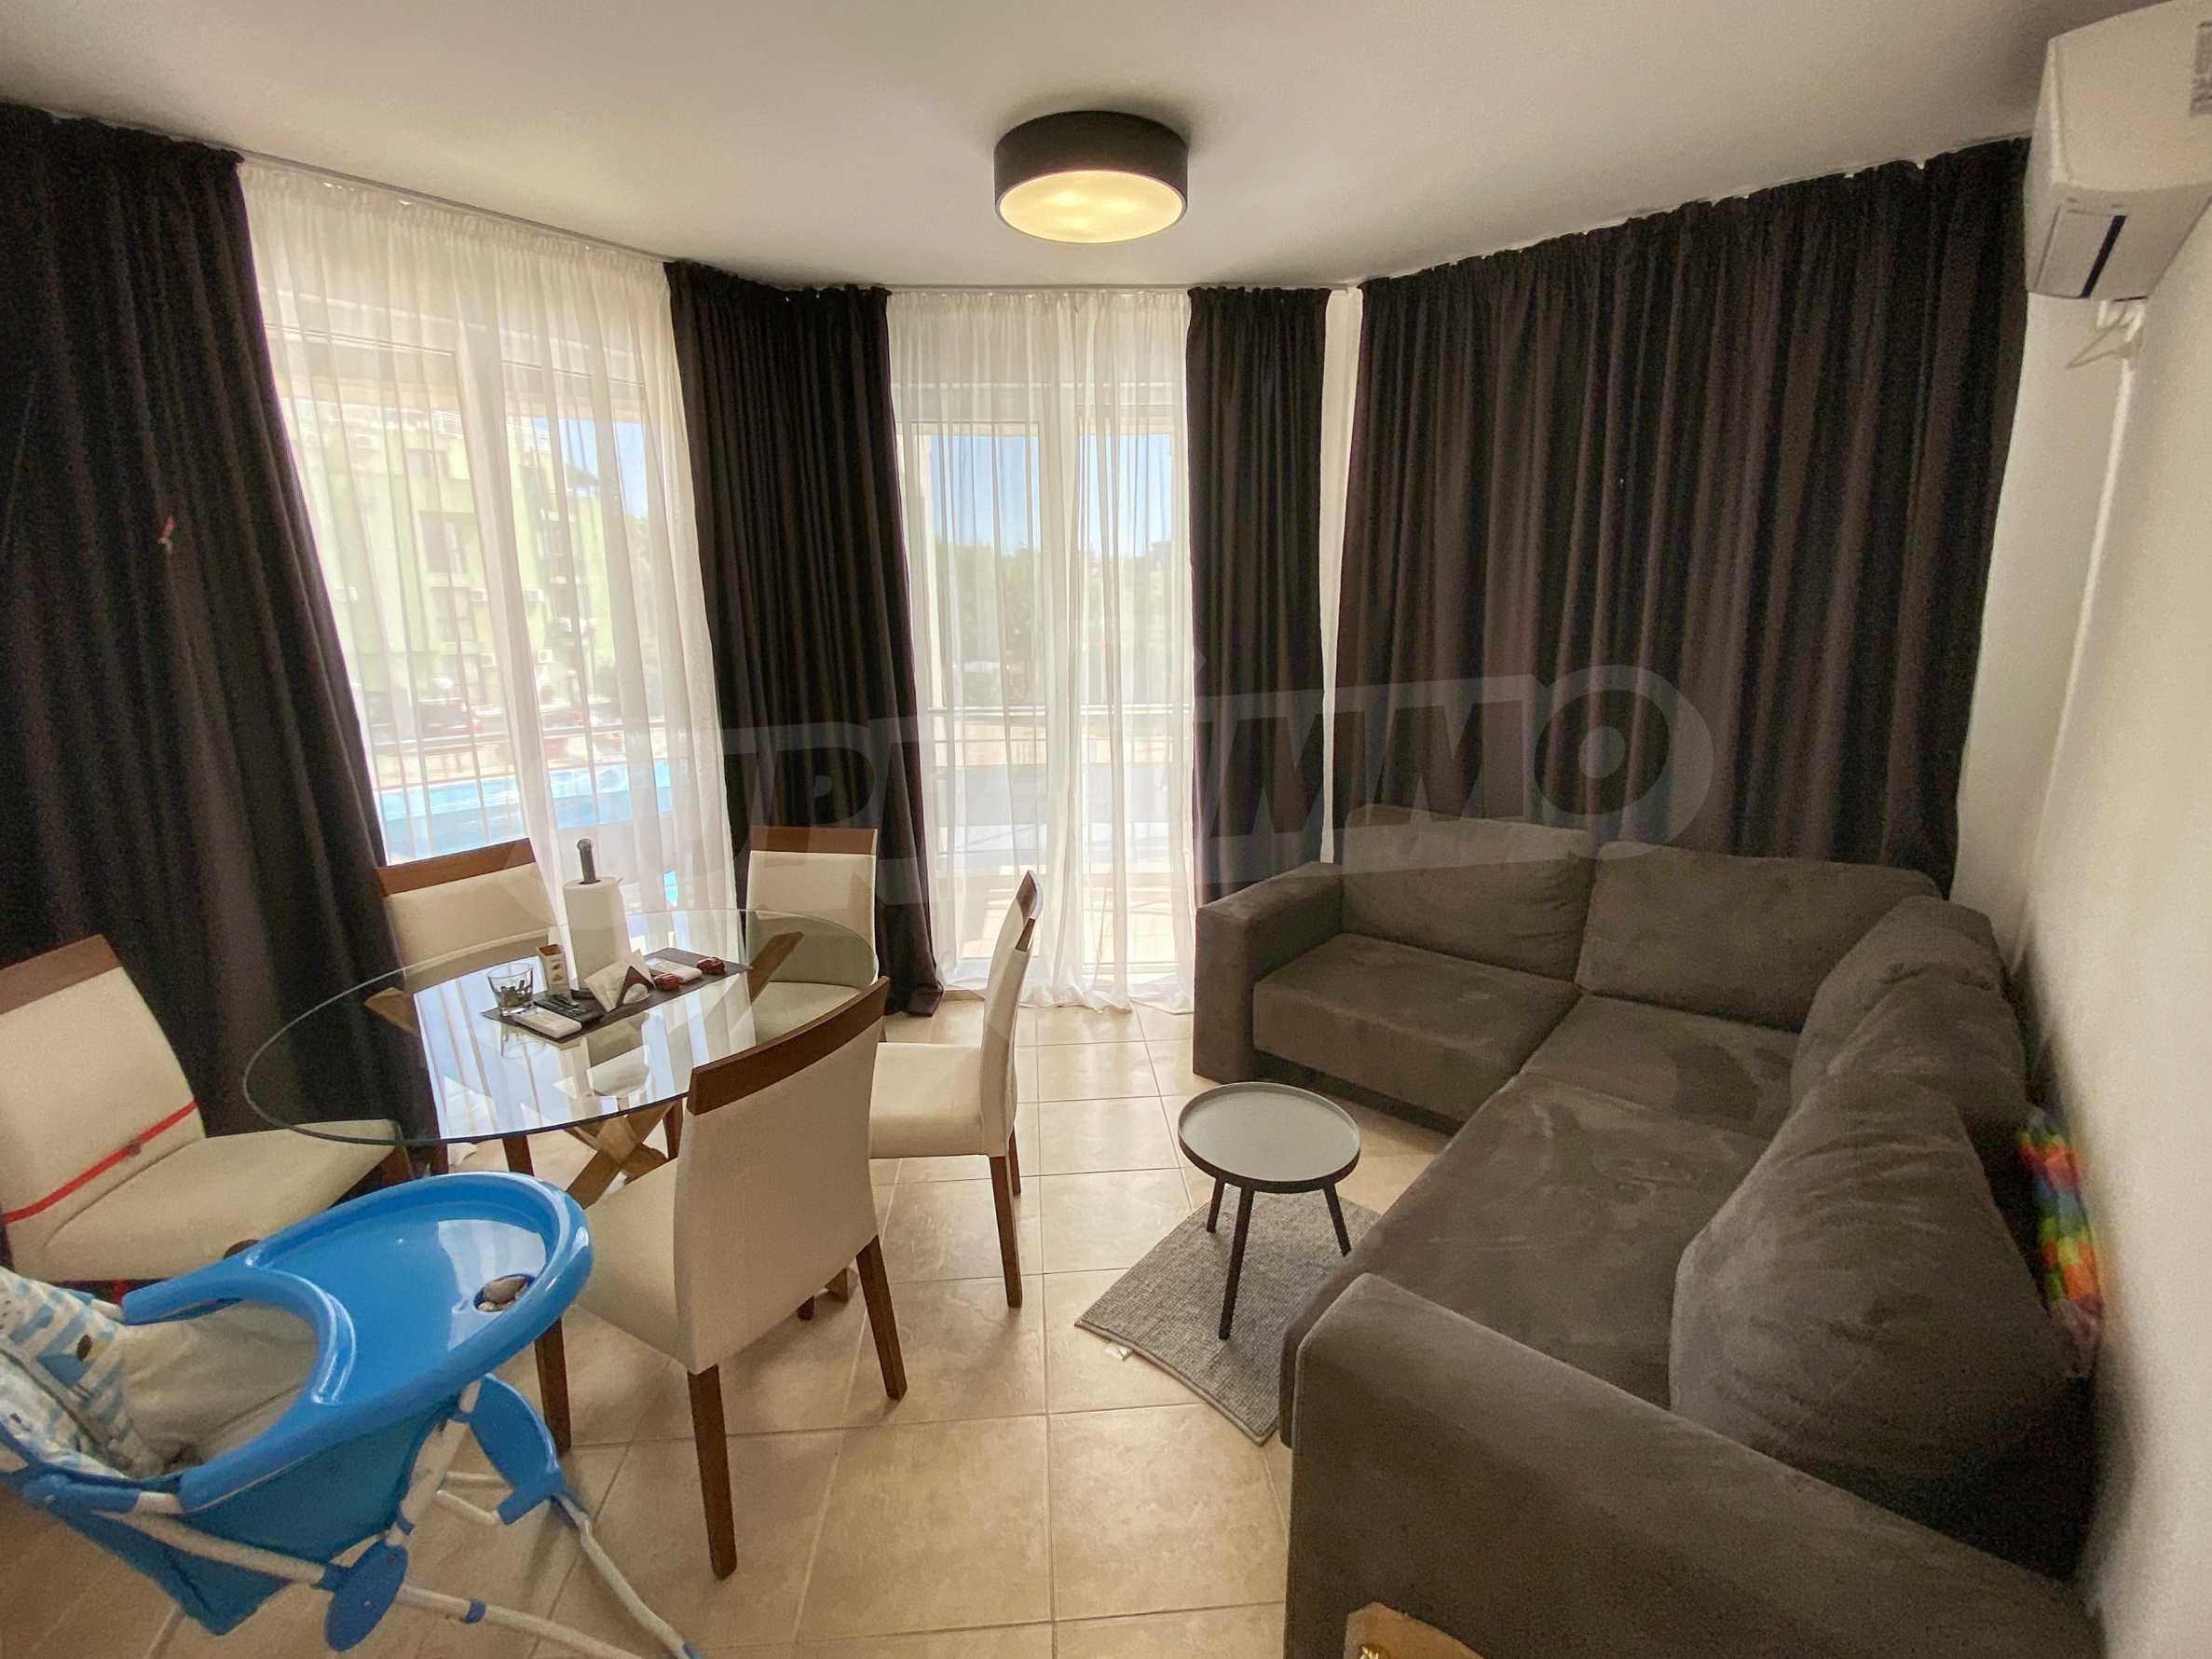 Тристаен апартамент близо до плажа в комплекс Емберли в Лозенец (ап. №201) 9